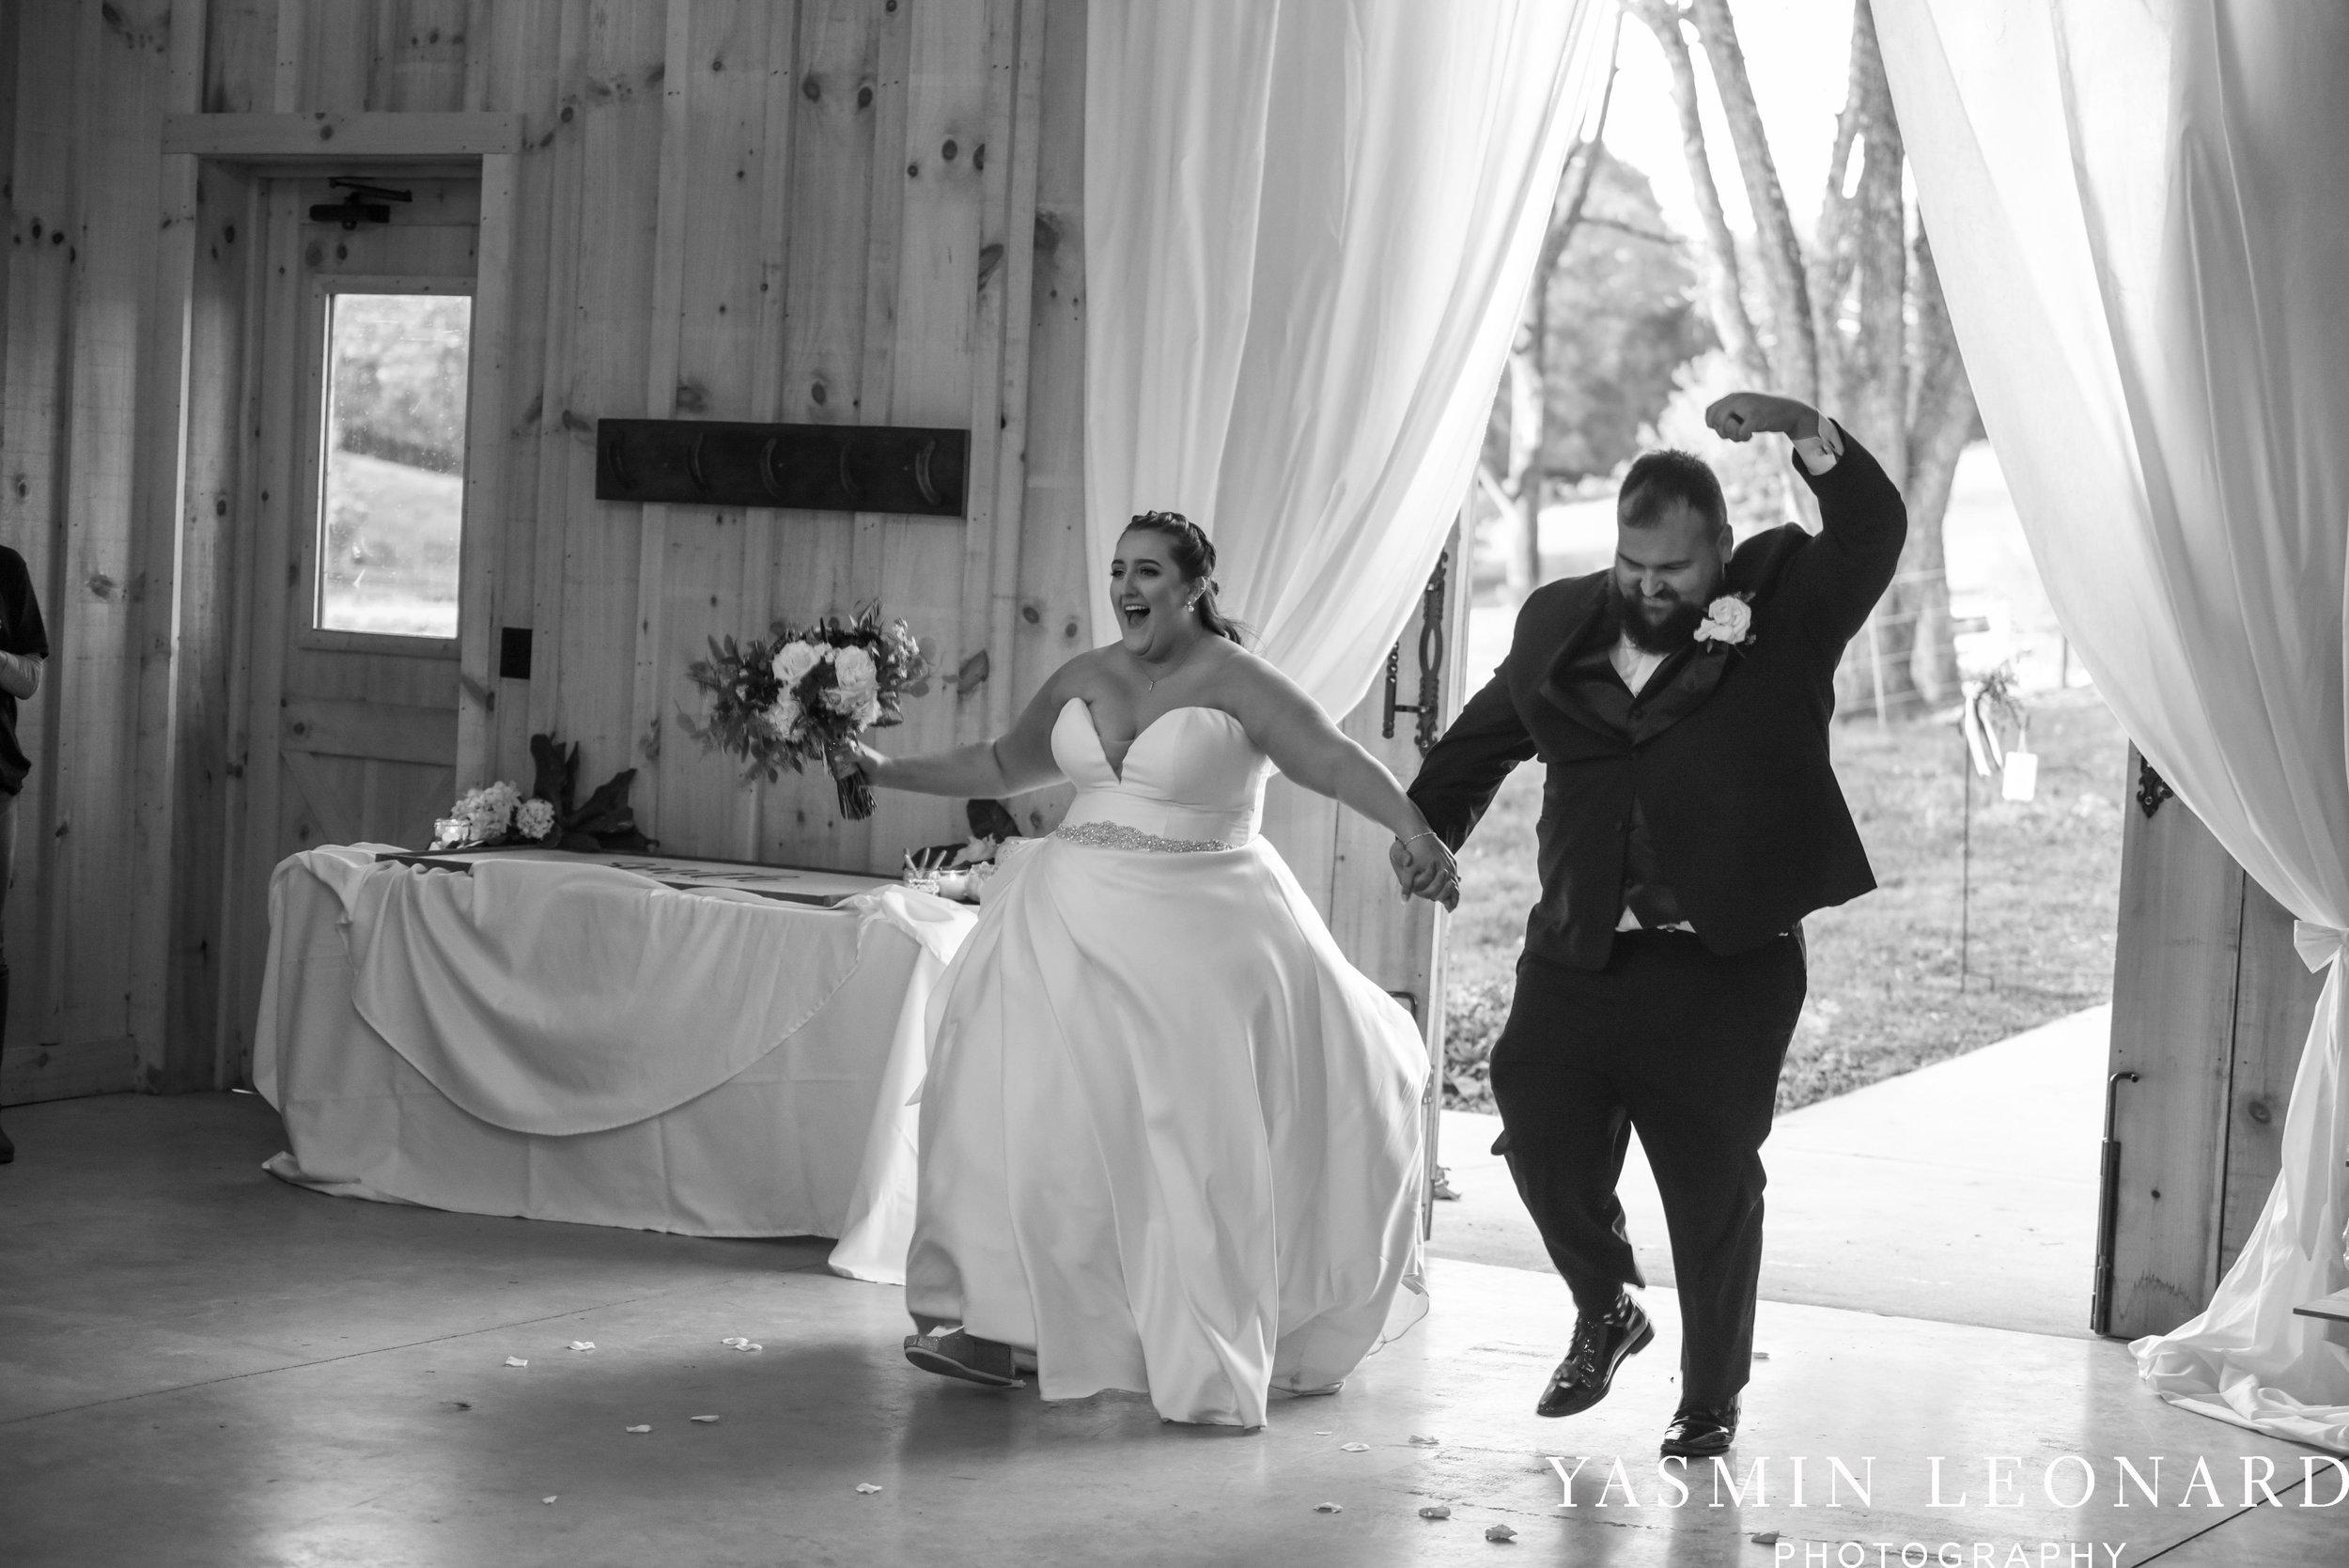 Wesley Memorial United Methodist Church - Old Homeplace Winery - High Point Weddings - High Point Wedding Photographer - NC Weddings - NC Barn Venue - Yasmin Leonard Photography-53.jpg